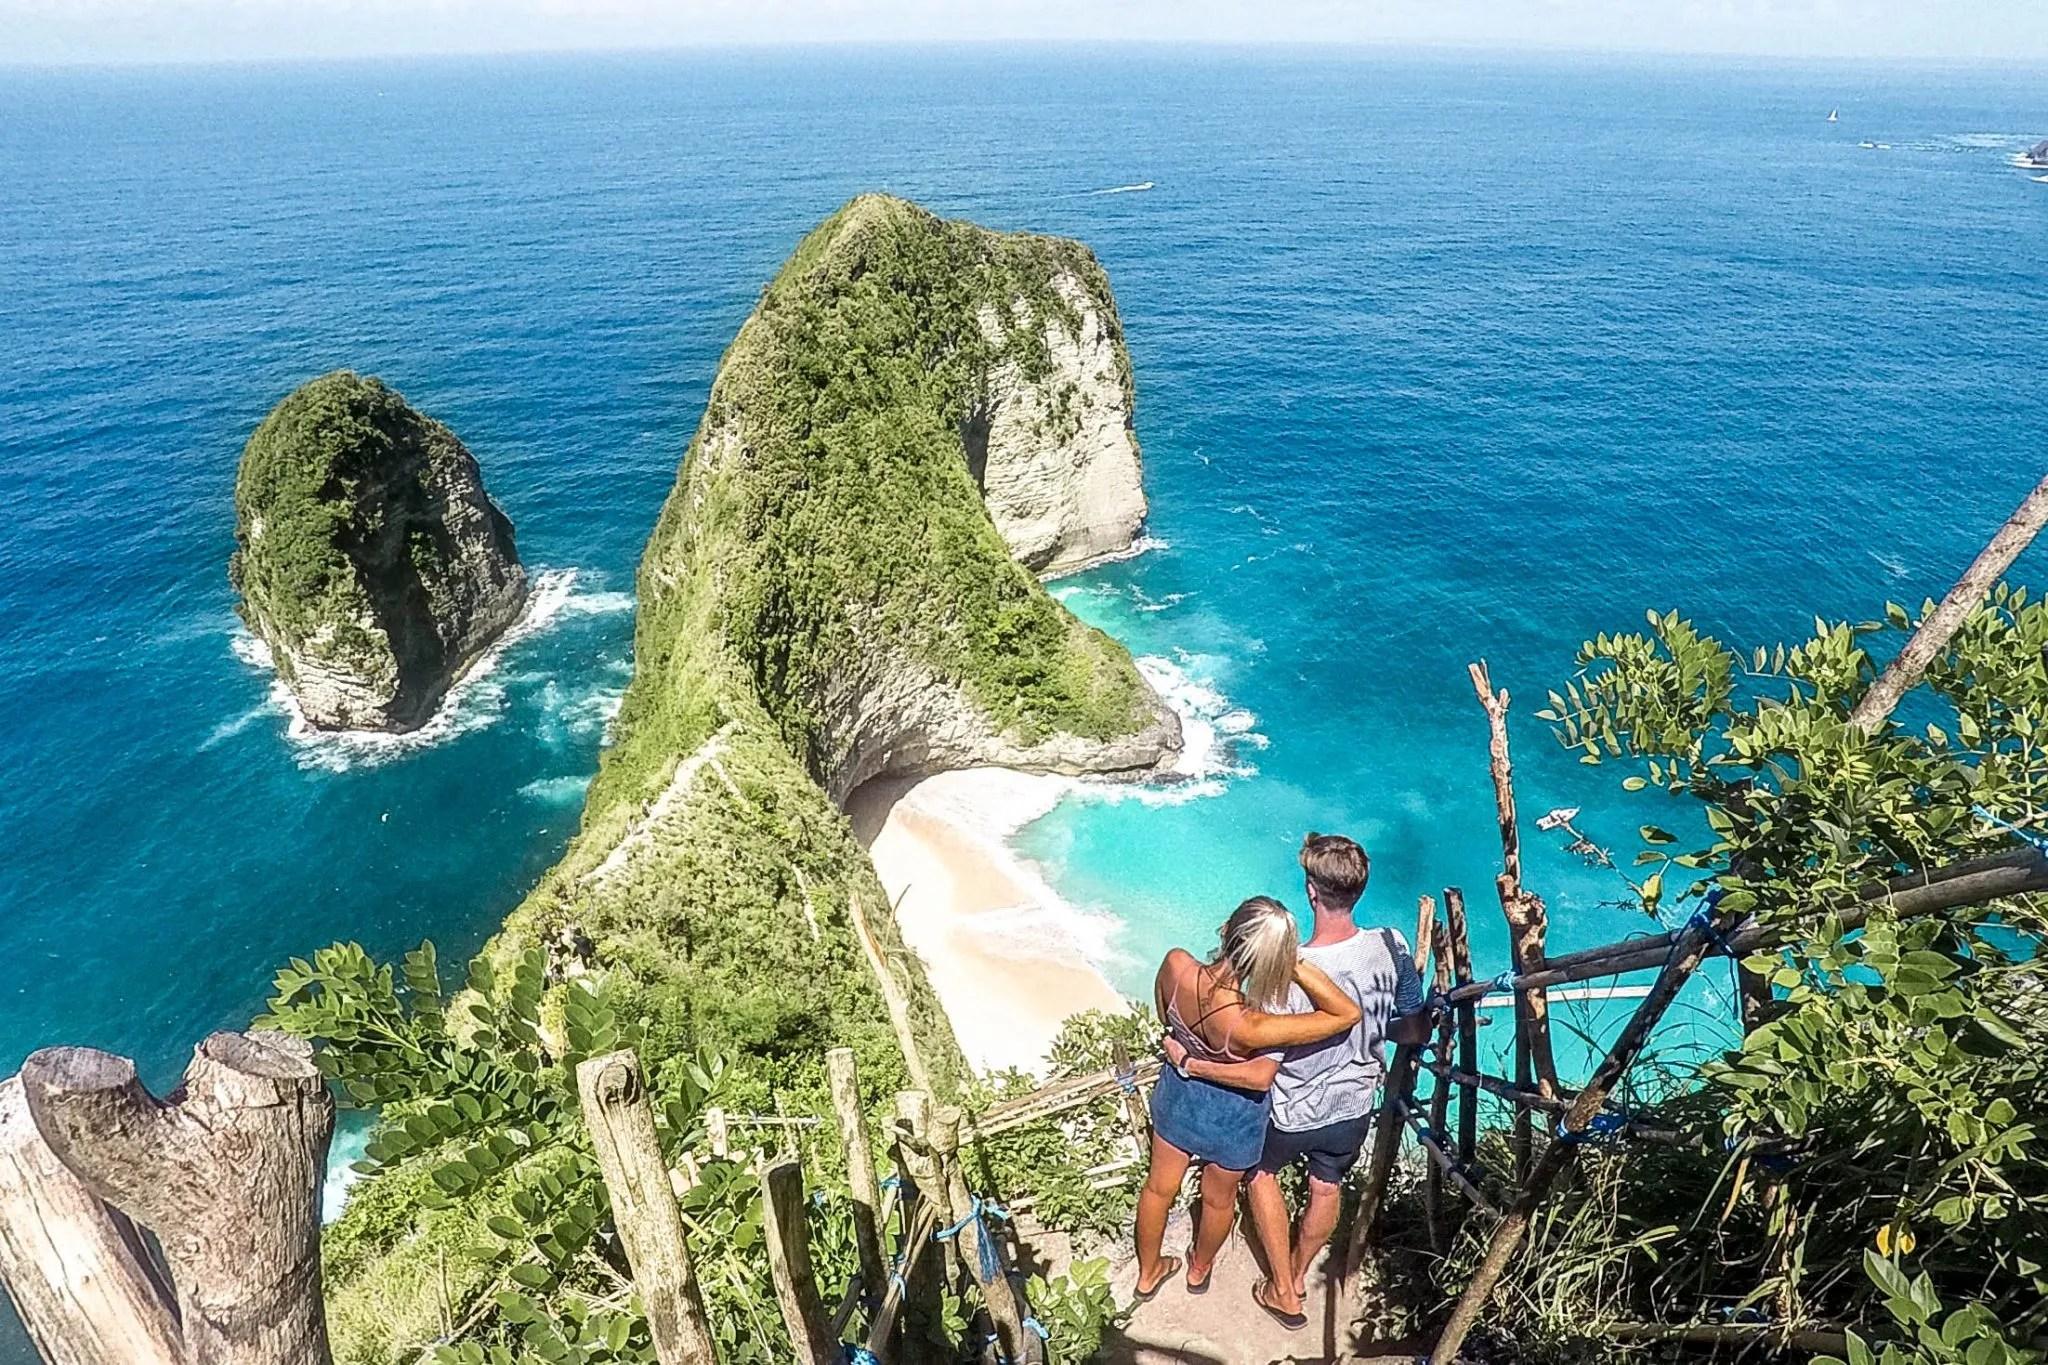 Wanderers & Warriors - Charlie & Lauren UK Travel Couple - Kelingking Beach Secret Point - Things To Do Nusa Penida - Our Nusa Penida Tour